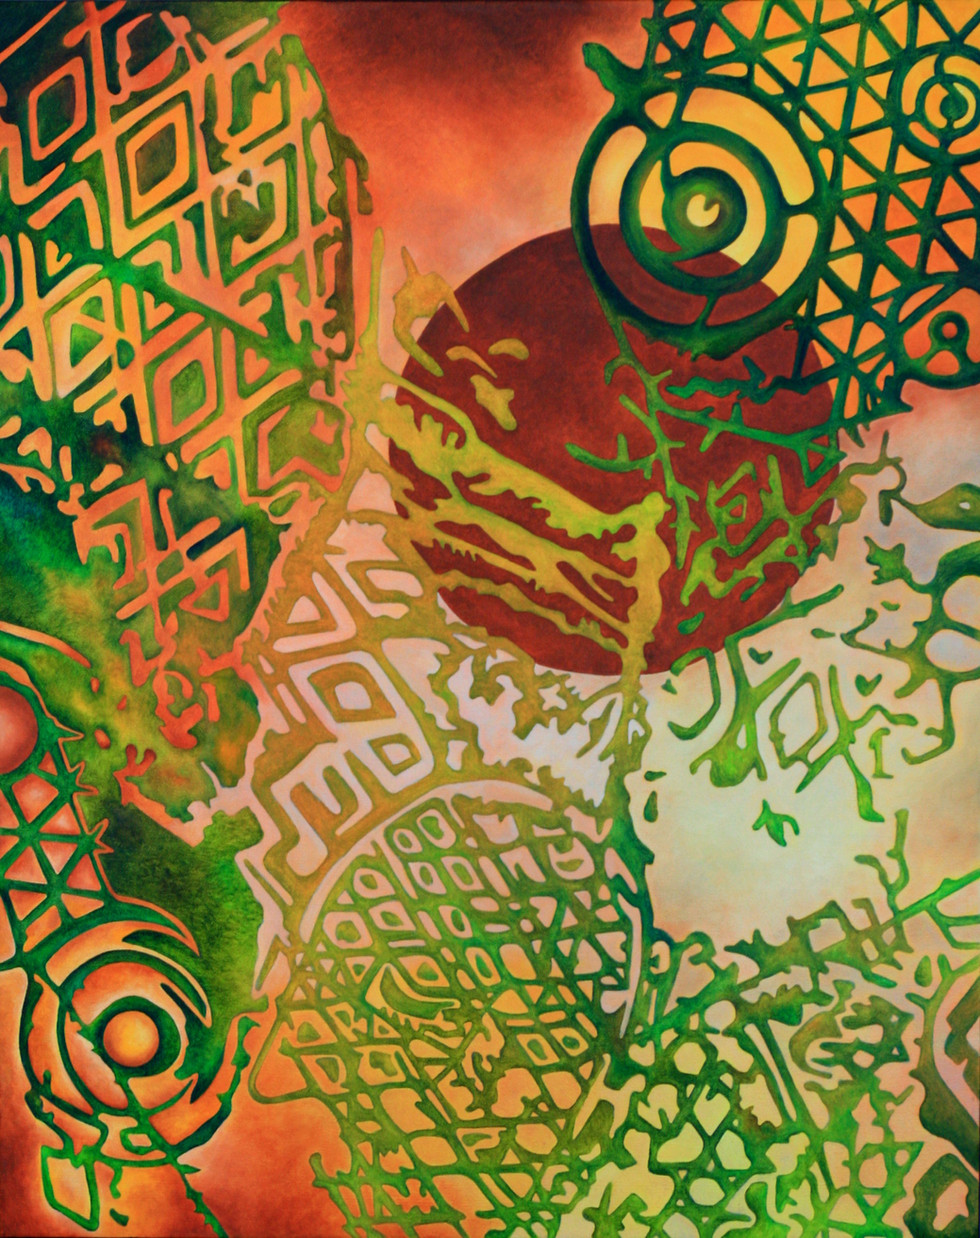 "REMNANTS No.4, Oil paint on canvas, 24"" x 30"", 2013"